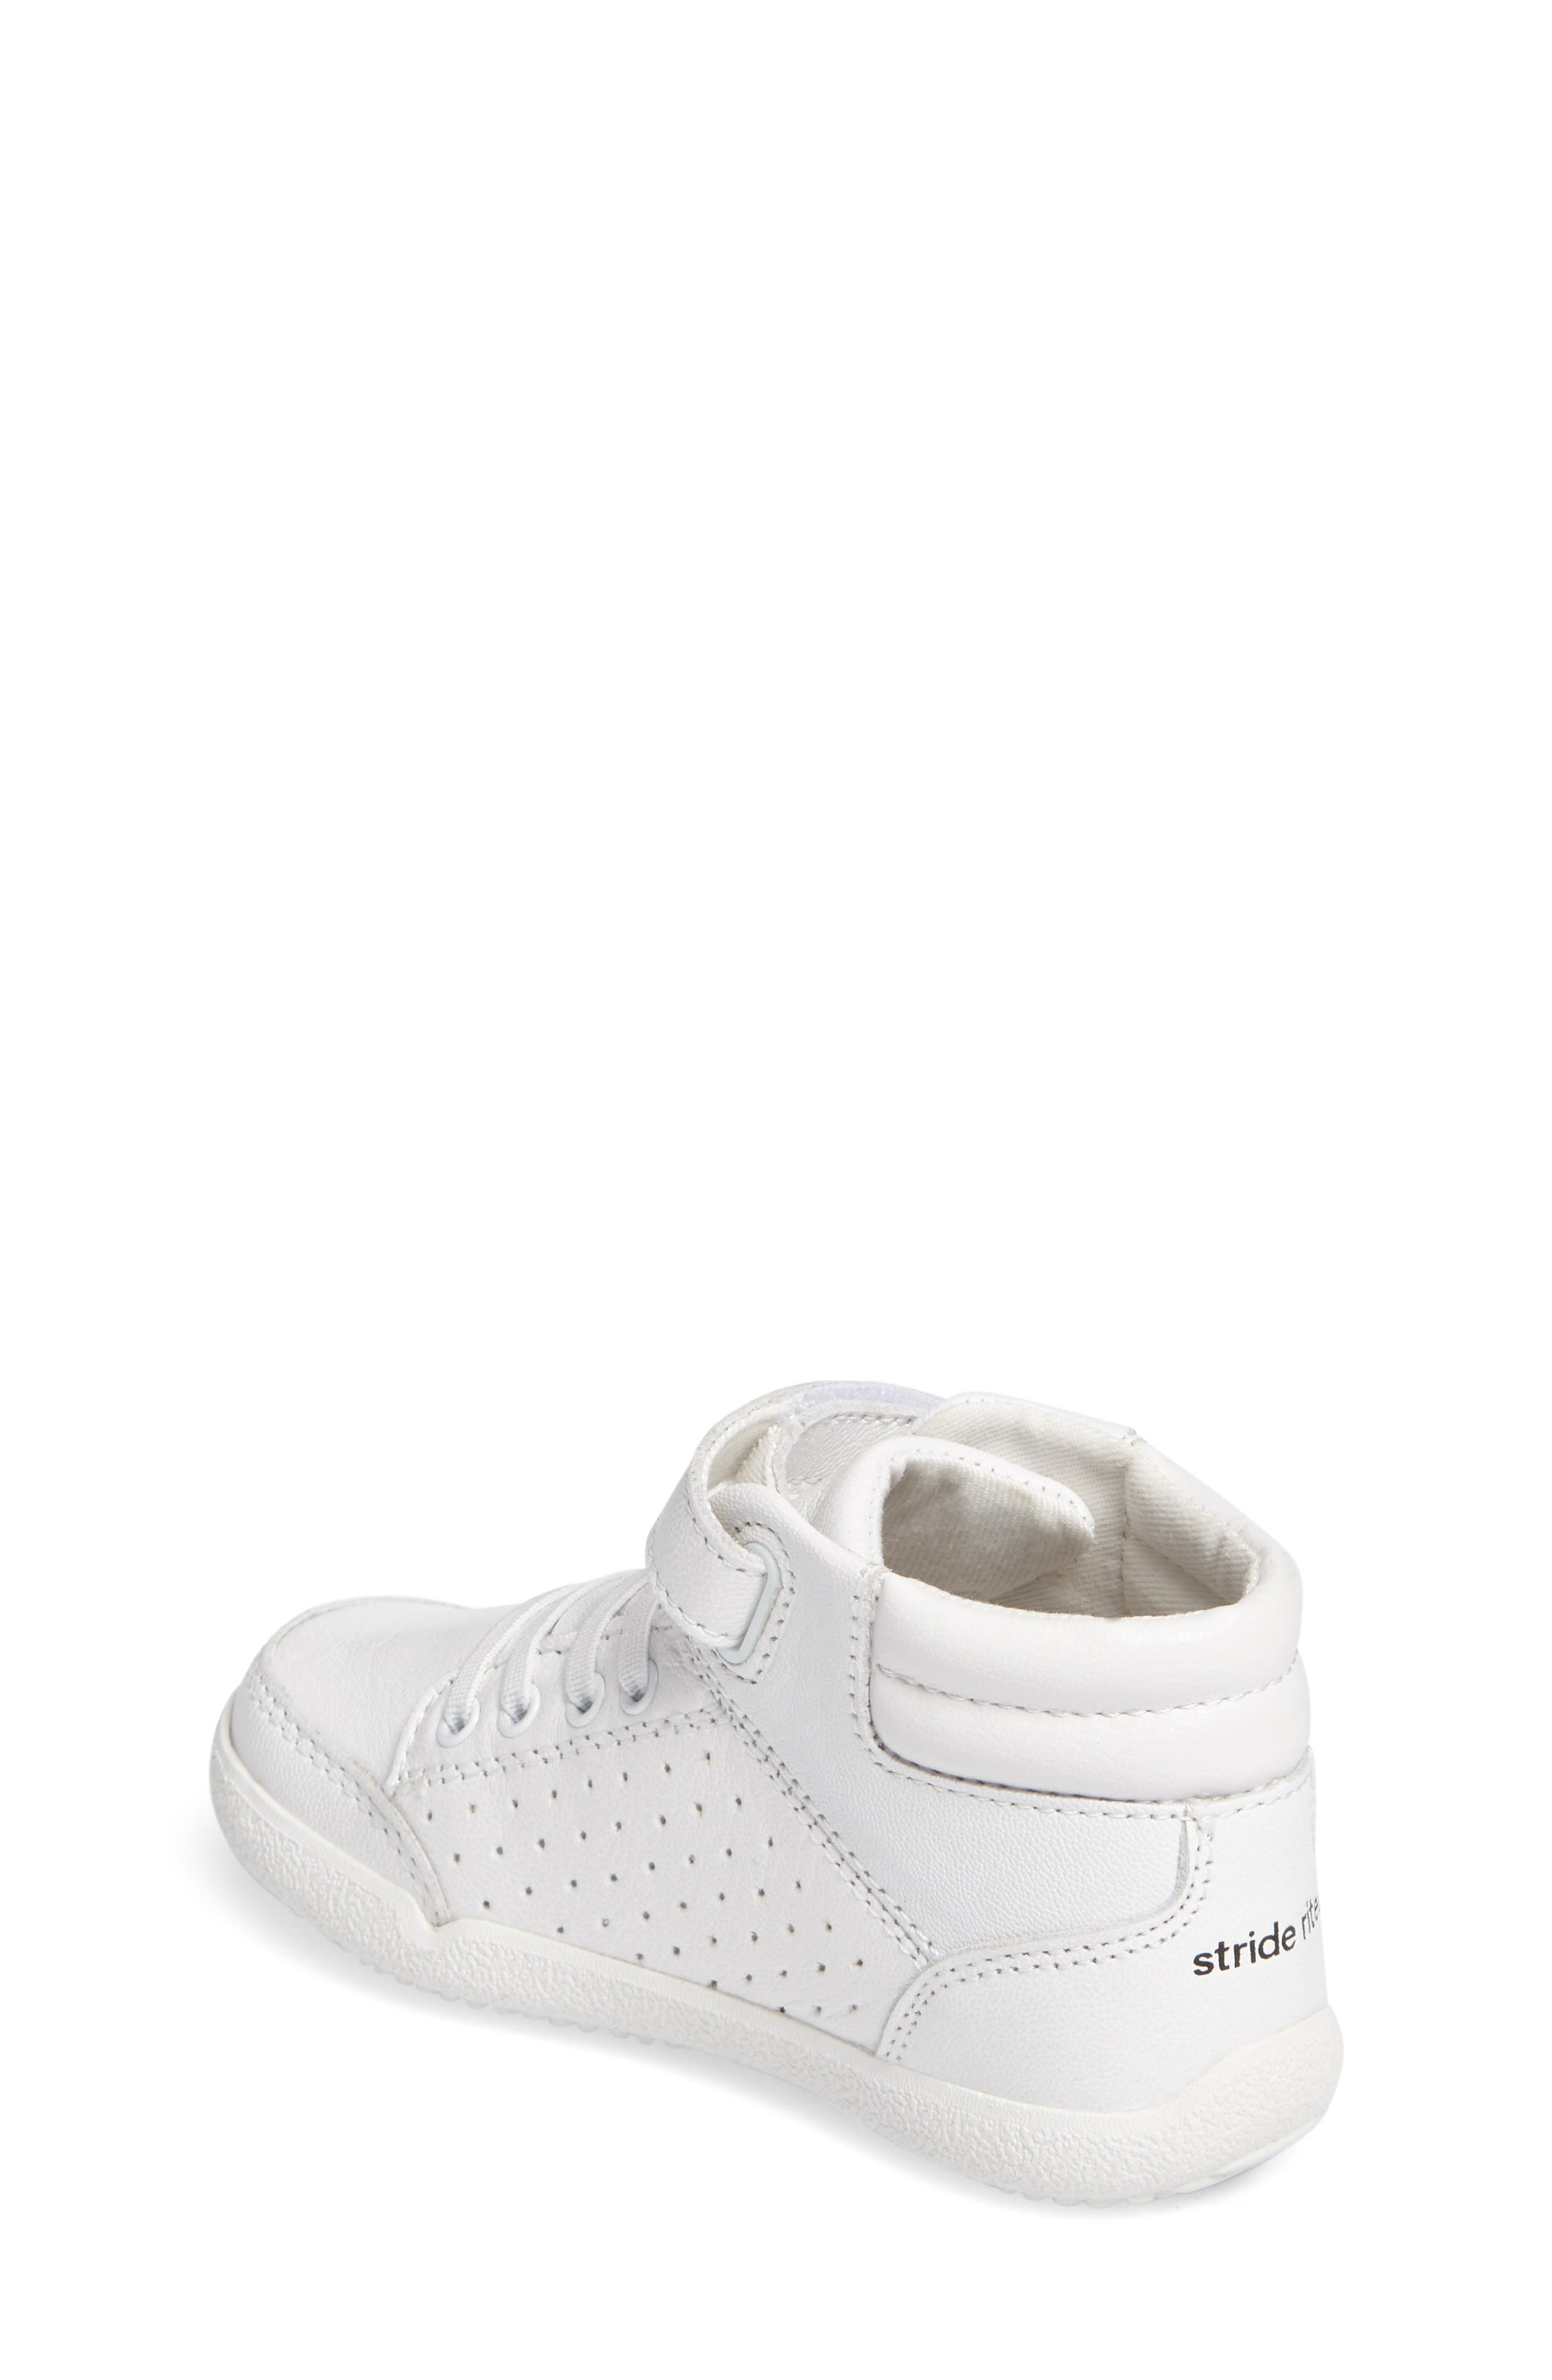 Alternate Image 2  - Stride Rite Stone High Top Sneaker (Baby, Walker & Toddler)